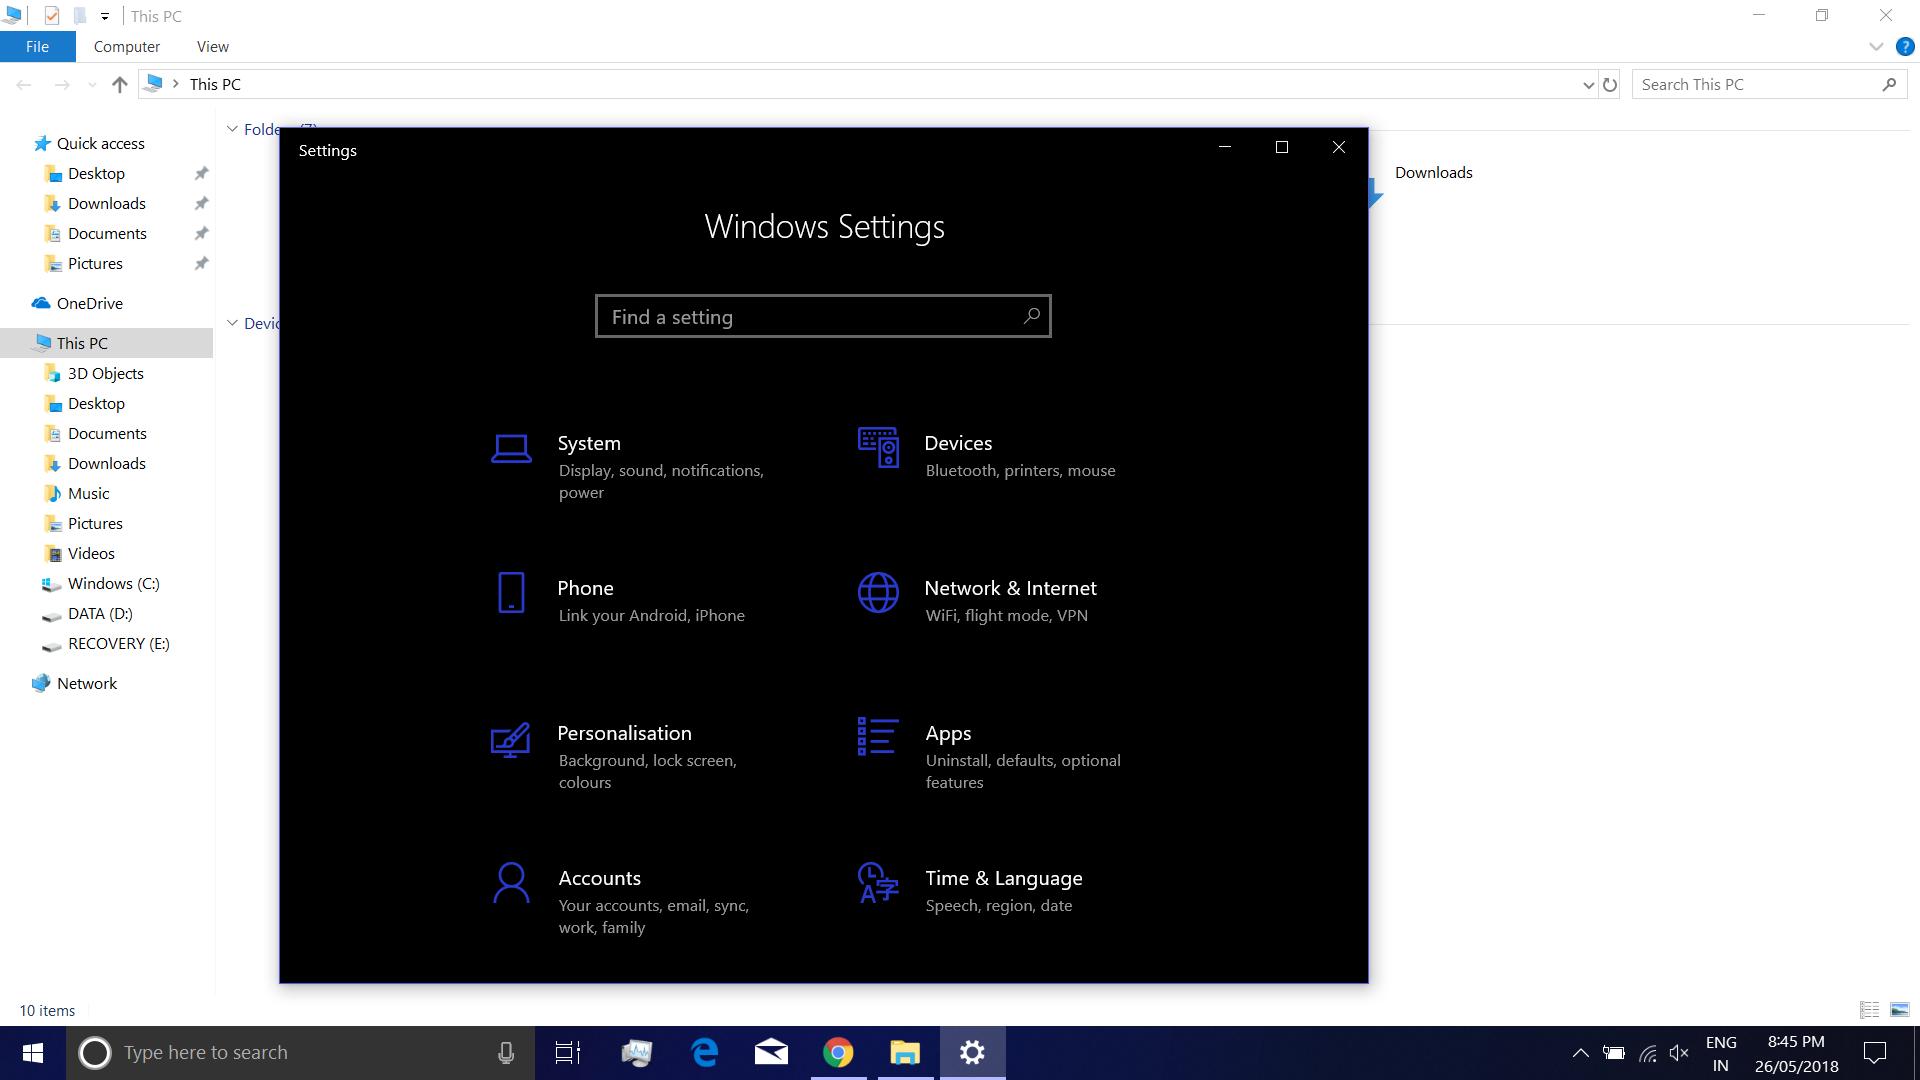 Dark Theme Of File Explorer Windows 10 - HD Wallpaper